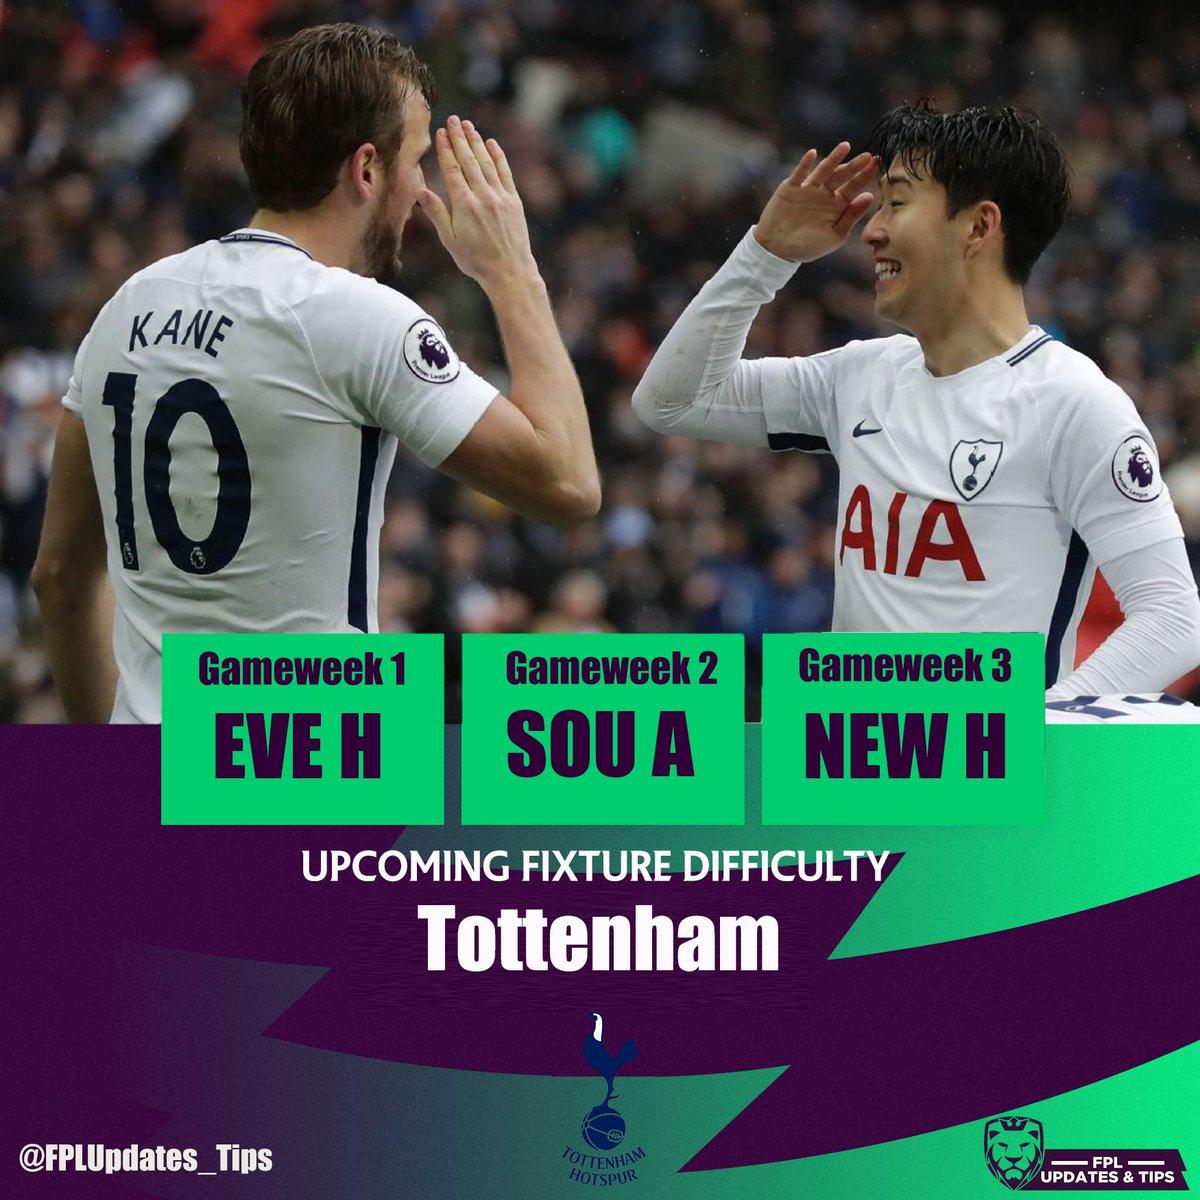 Fpl Updates Tips On Twitter Tottenham Hotspur S First 10 Plfixtures H Vs Everton A Vs Southampton H Vs Newcastle A Vs Man Utd H Vs West Ham A Vs Burnley H Vs